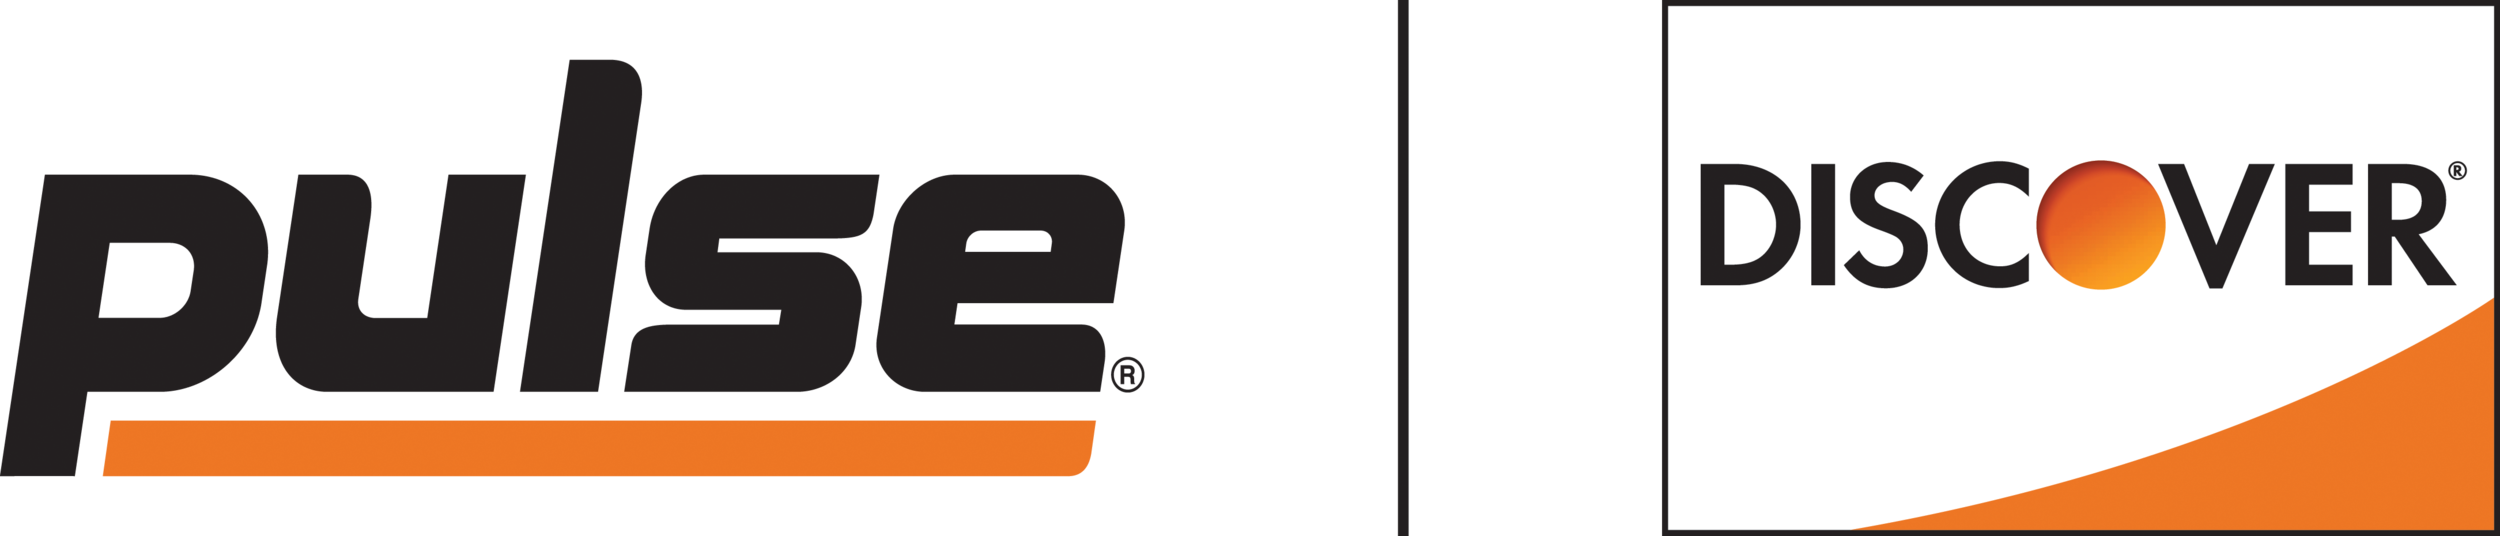 PulseDiscover-logos.png